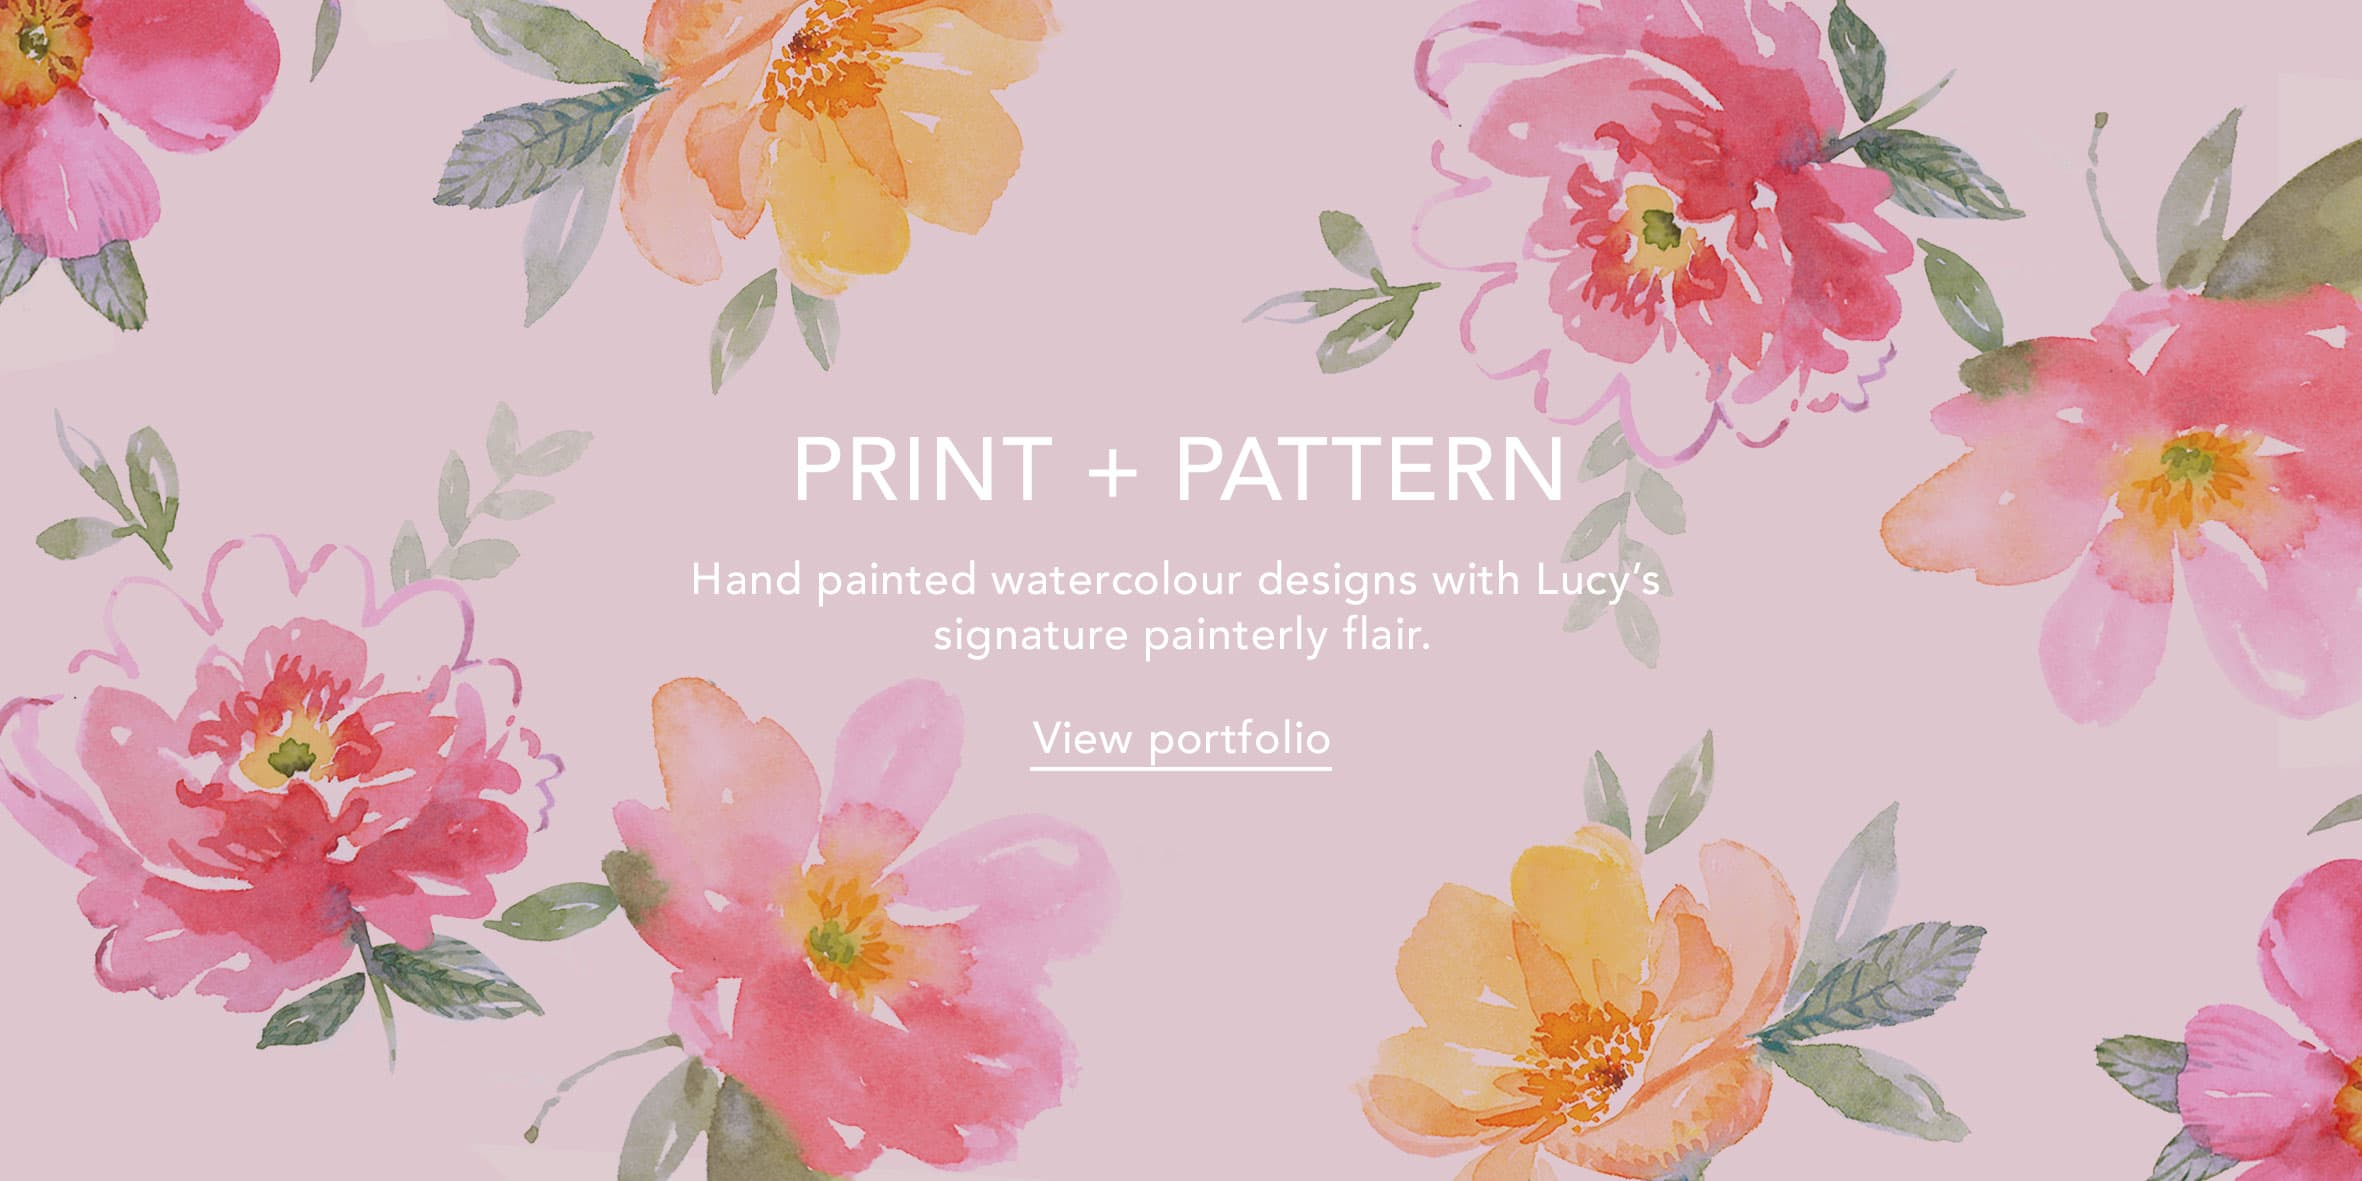 Print+Pattern-3B-TEXT.jpg